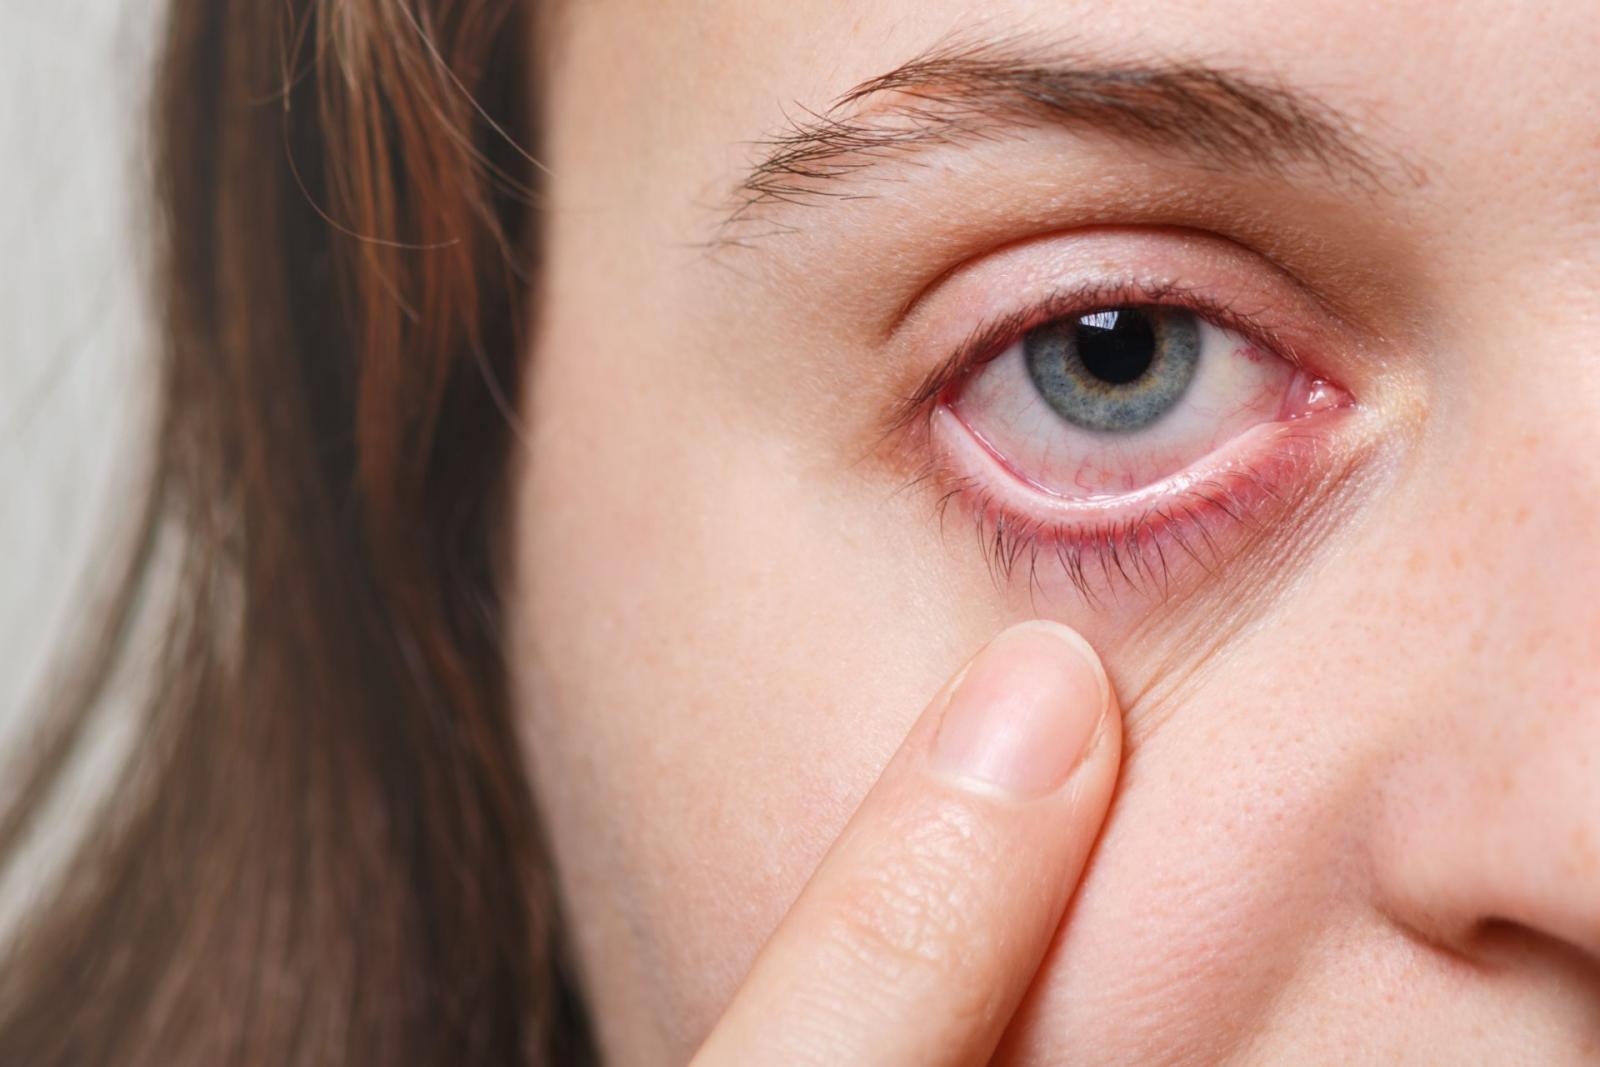 Alergia%20Ocular.jpg